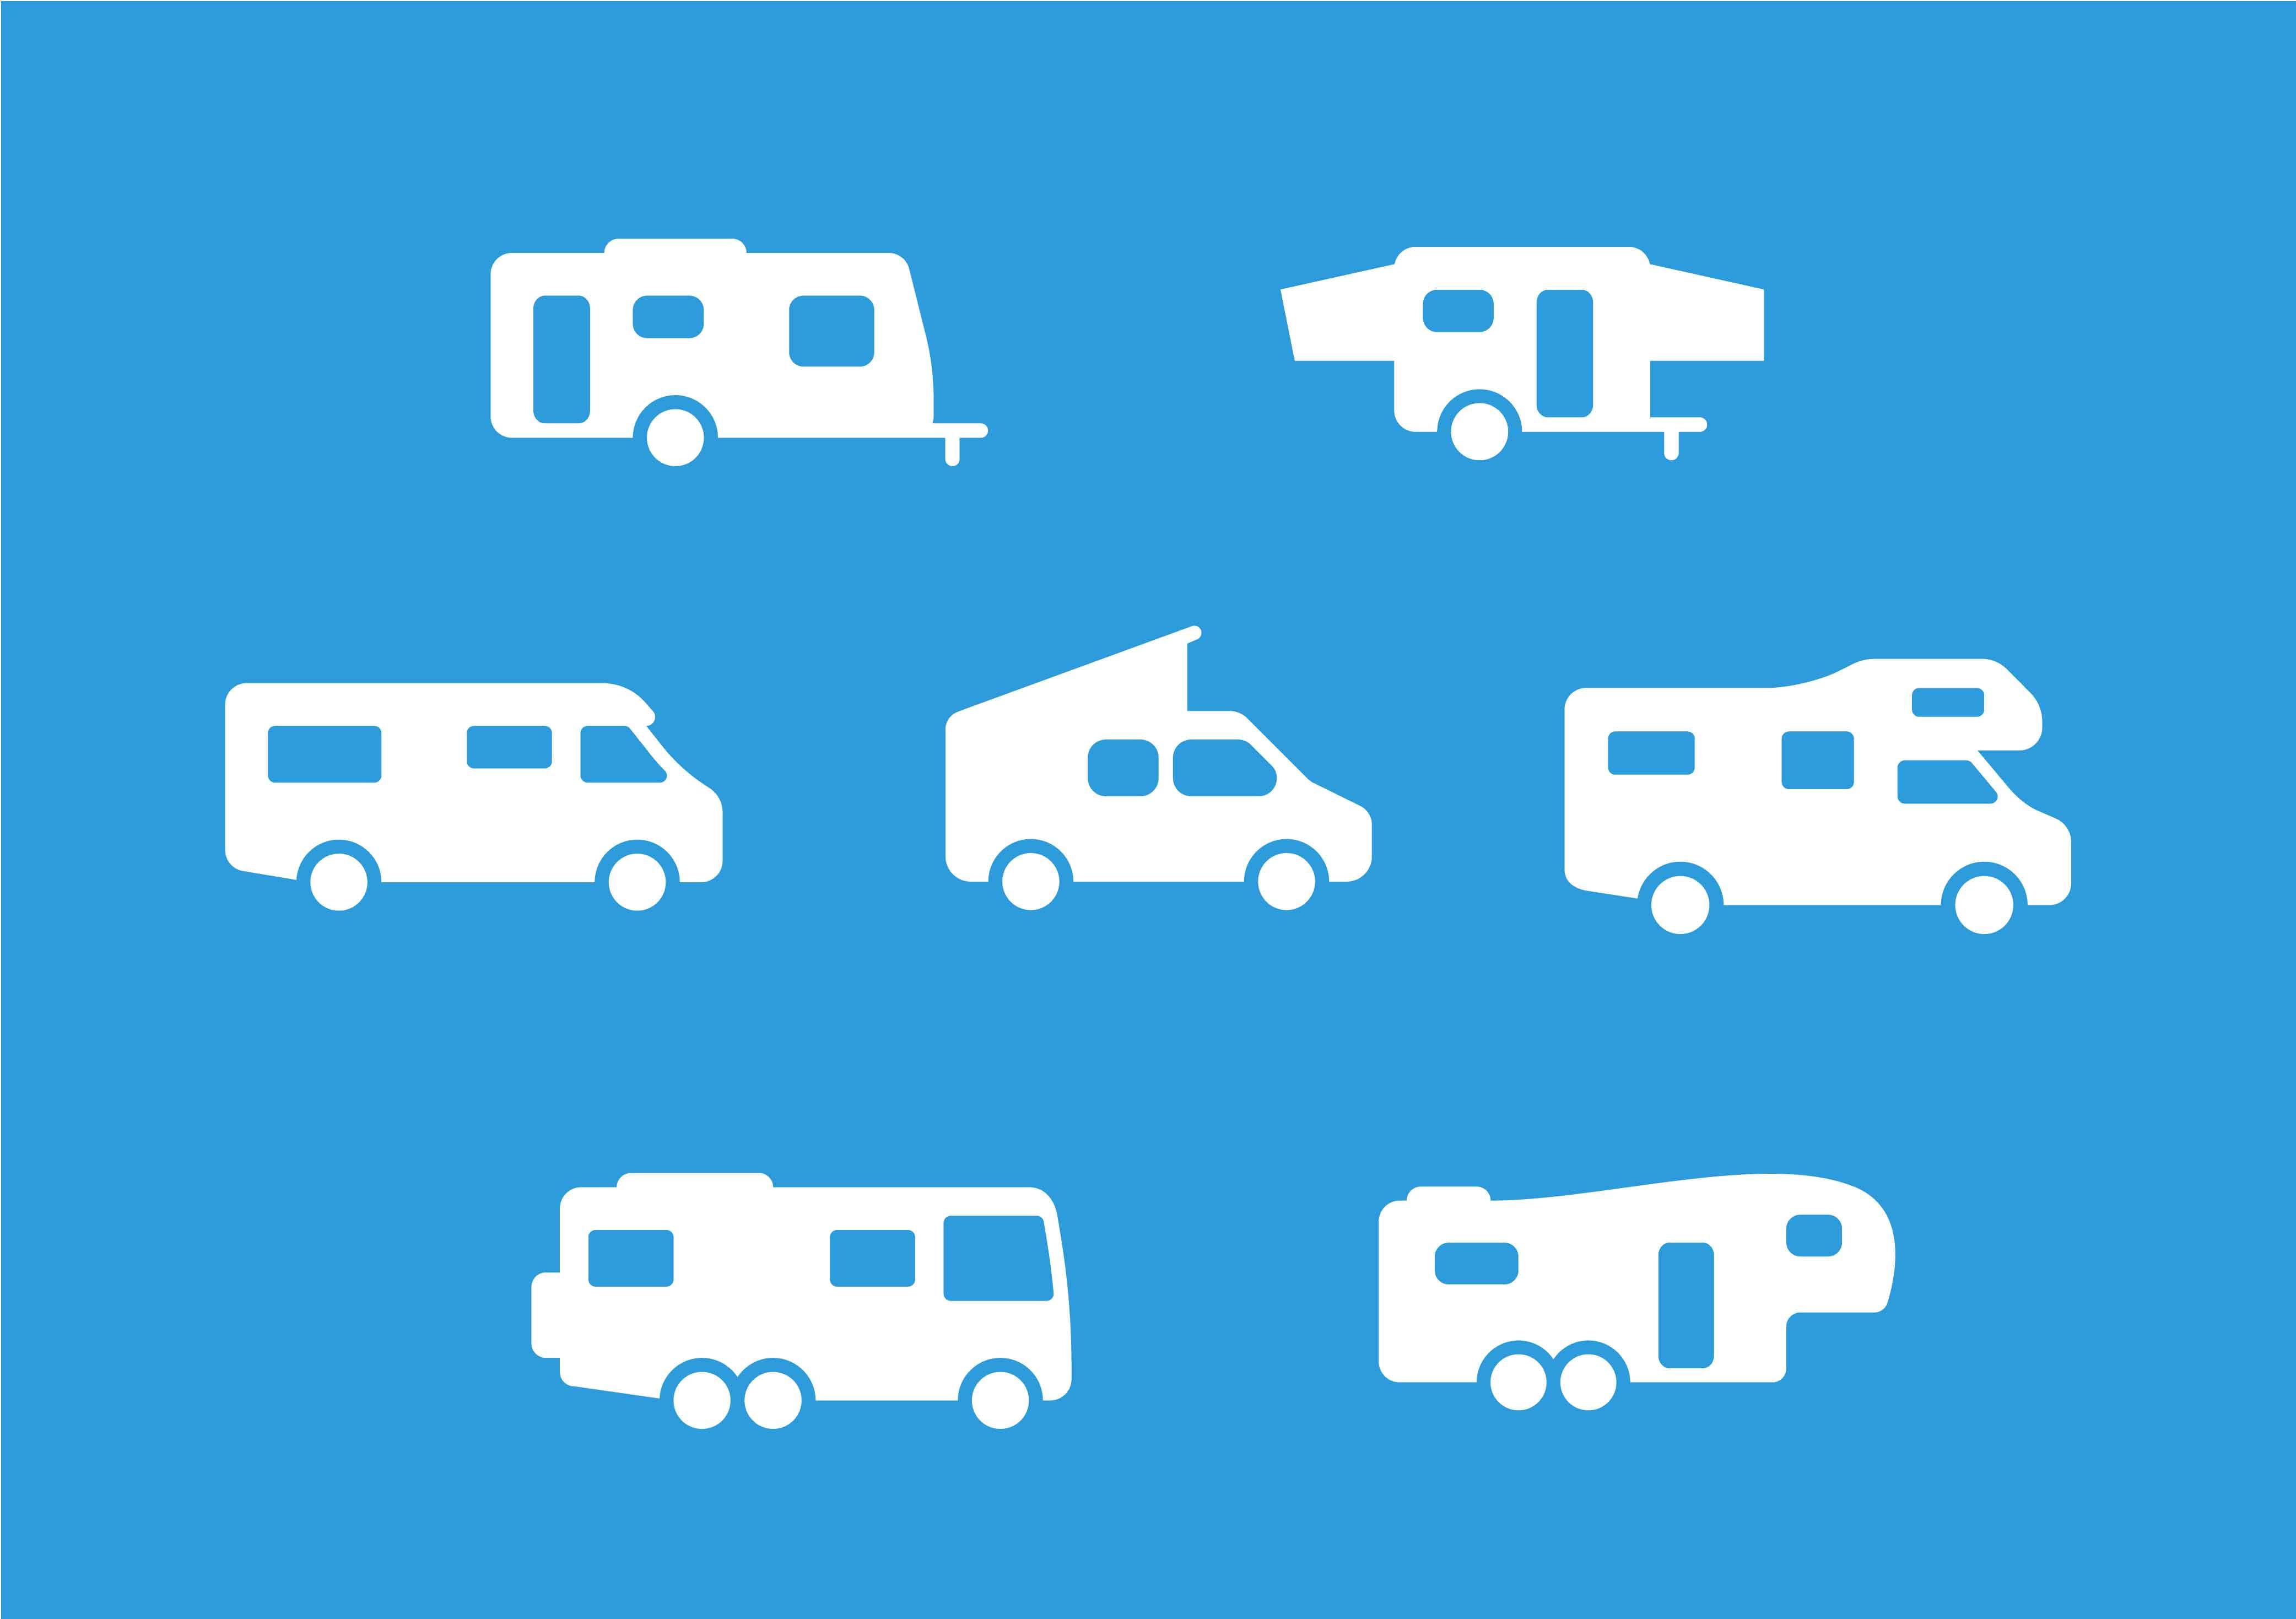 Abbildung Wohnmobil Typen